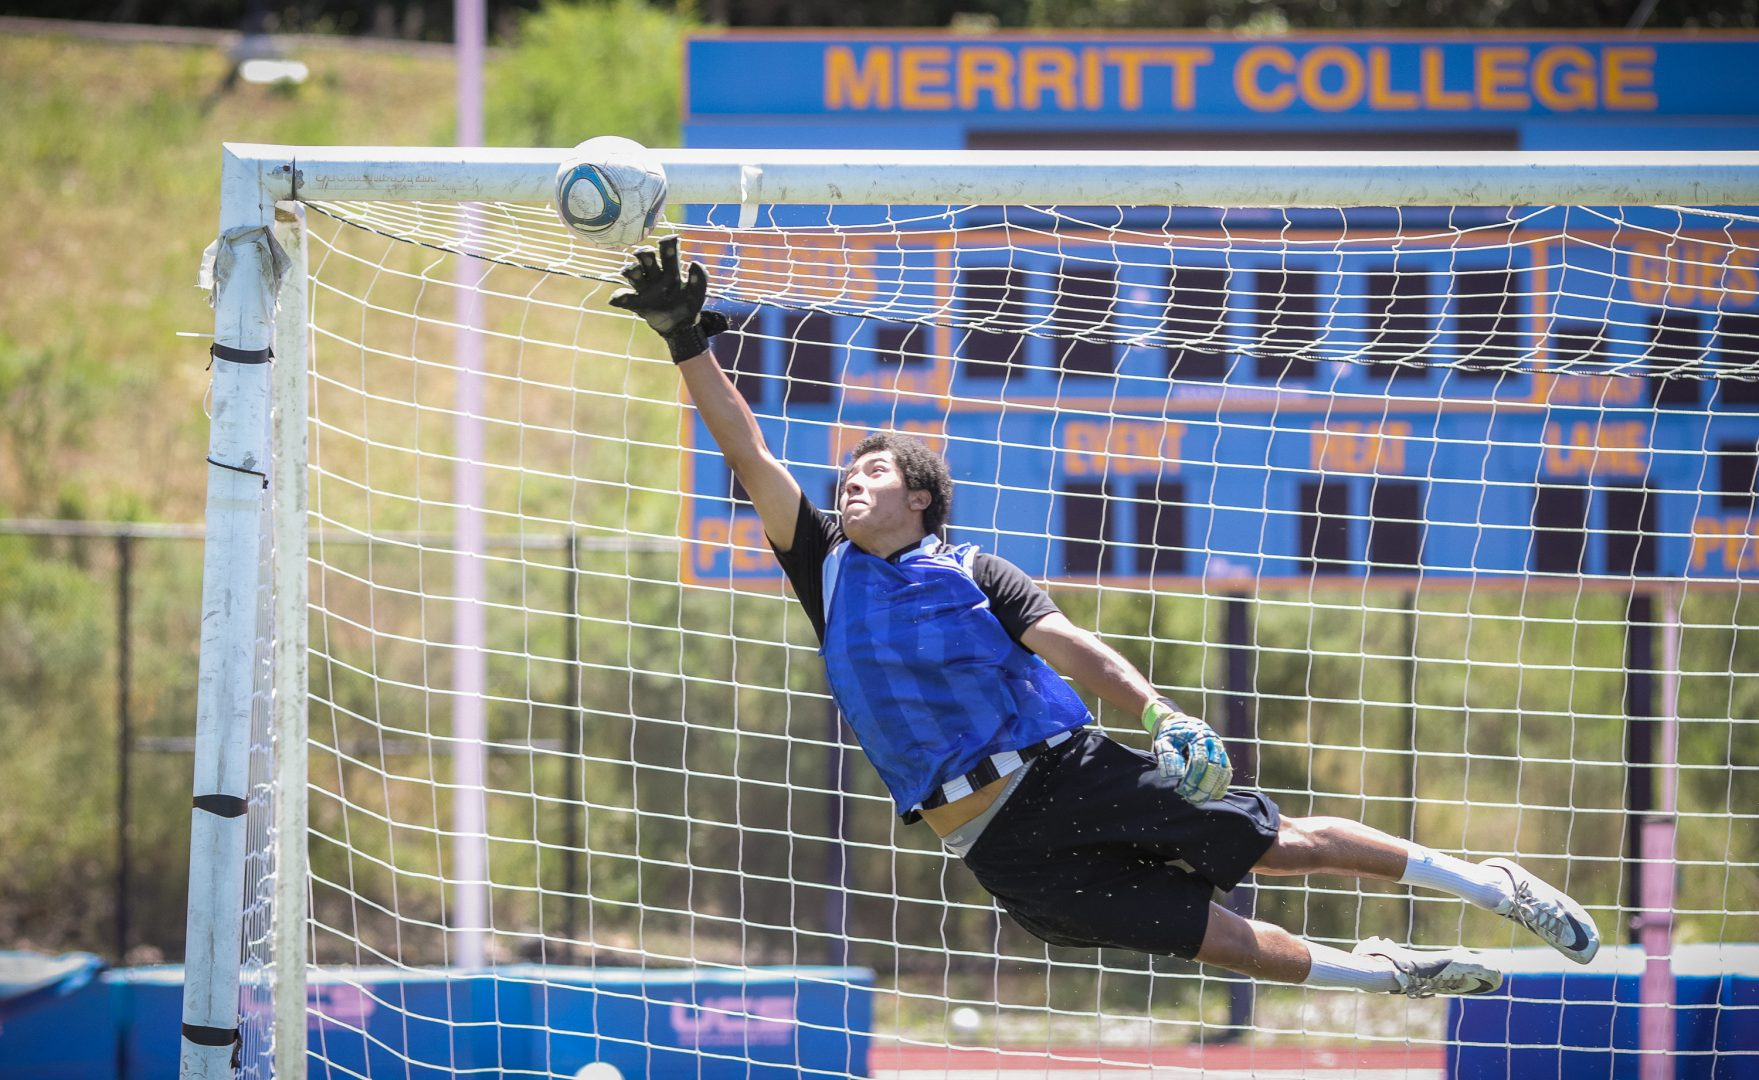 Goalie Roberto Llamos at Merritt College soccer practice